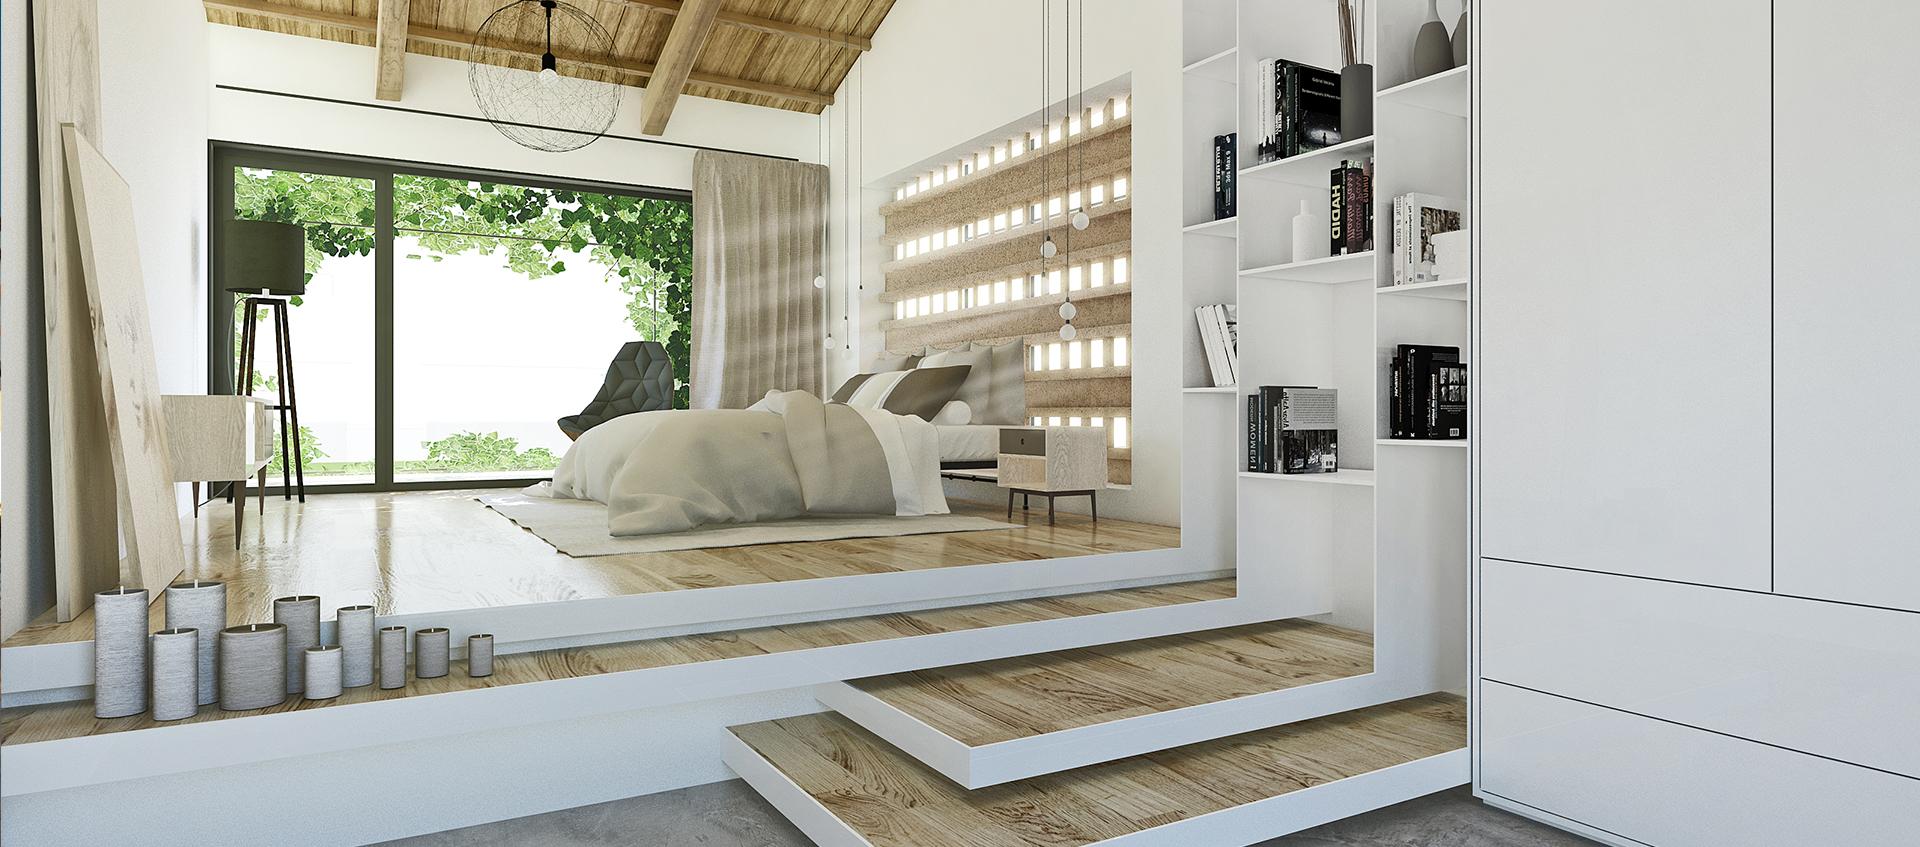 DFG-Architetti_Casale-DE_00_featured